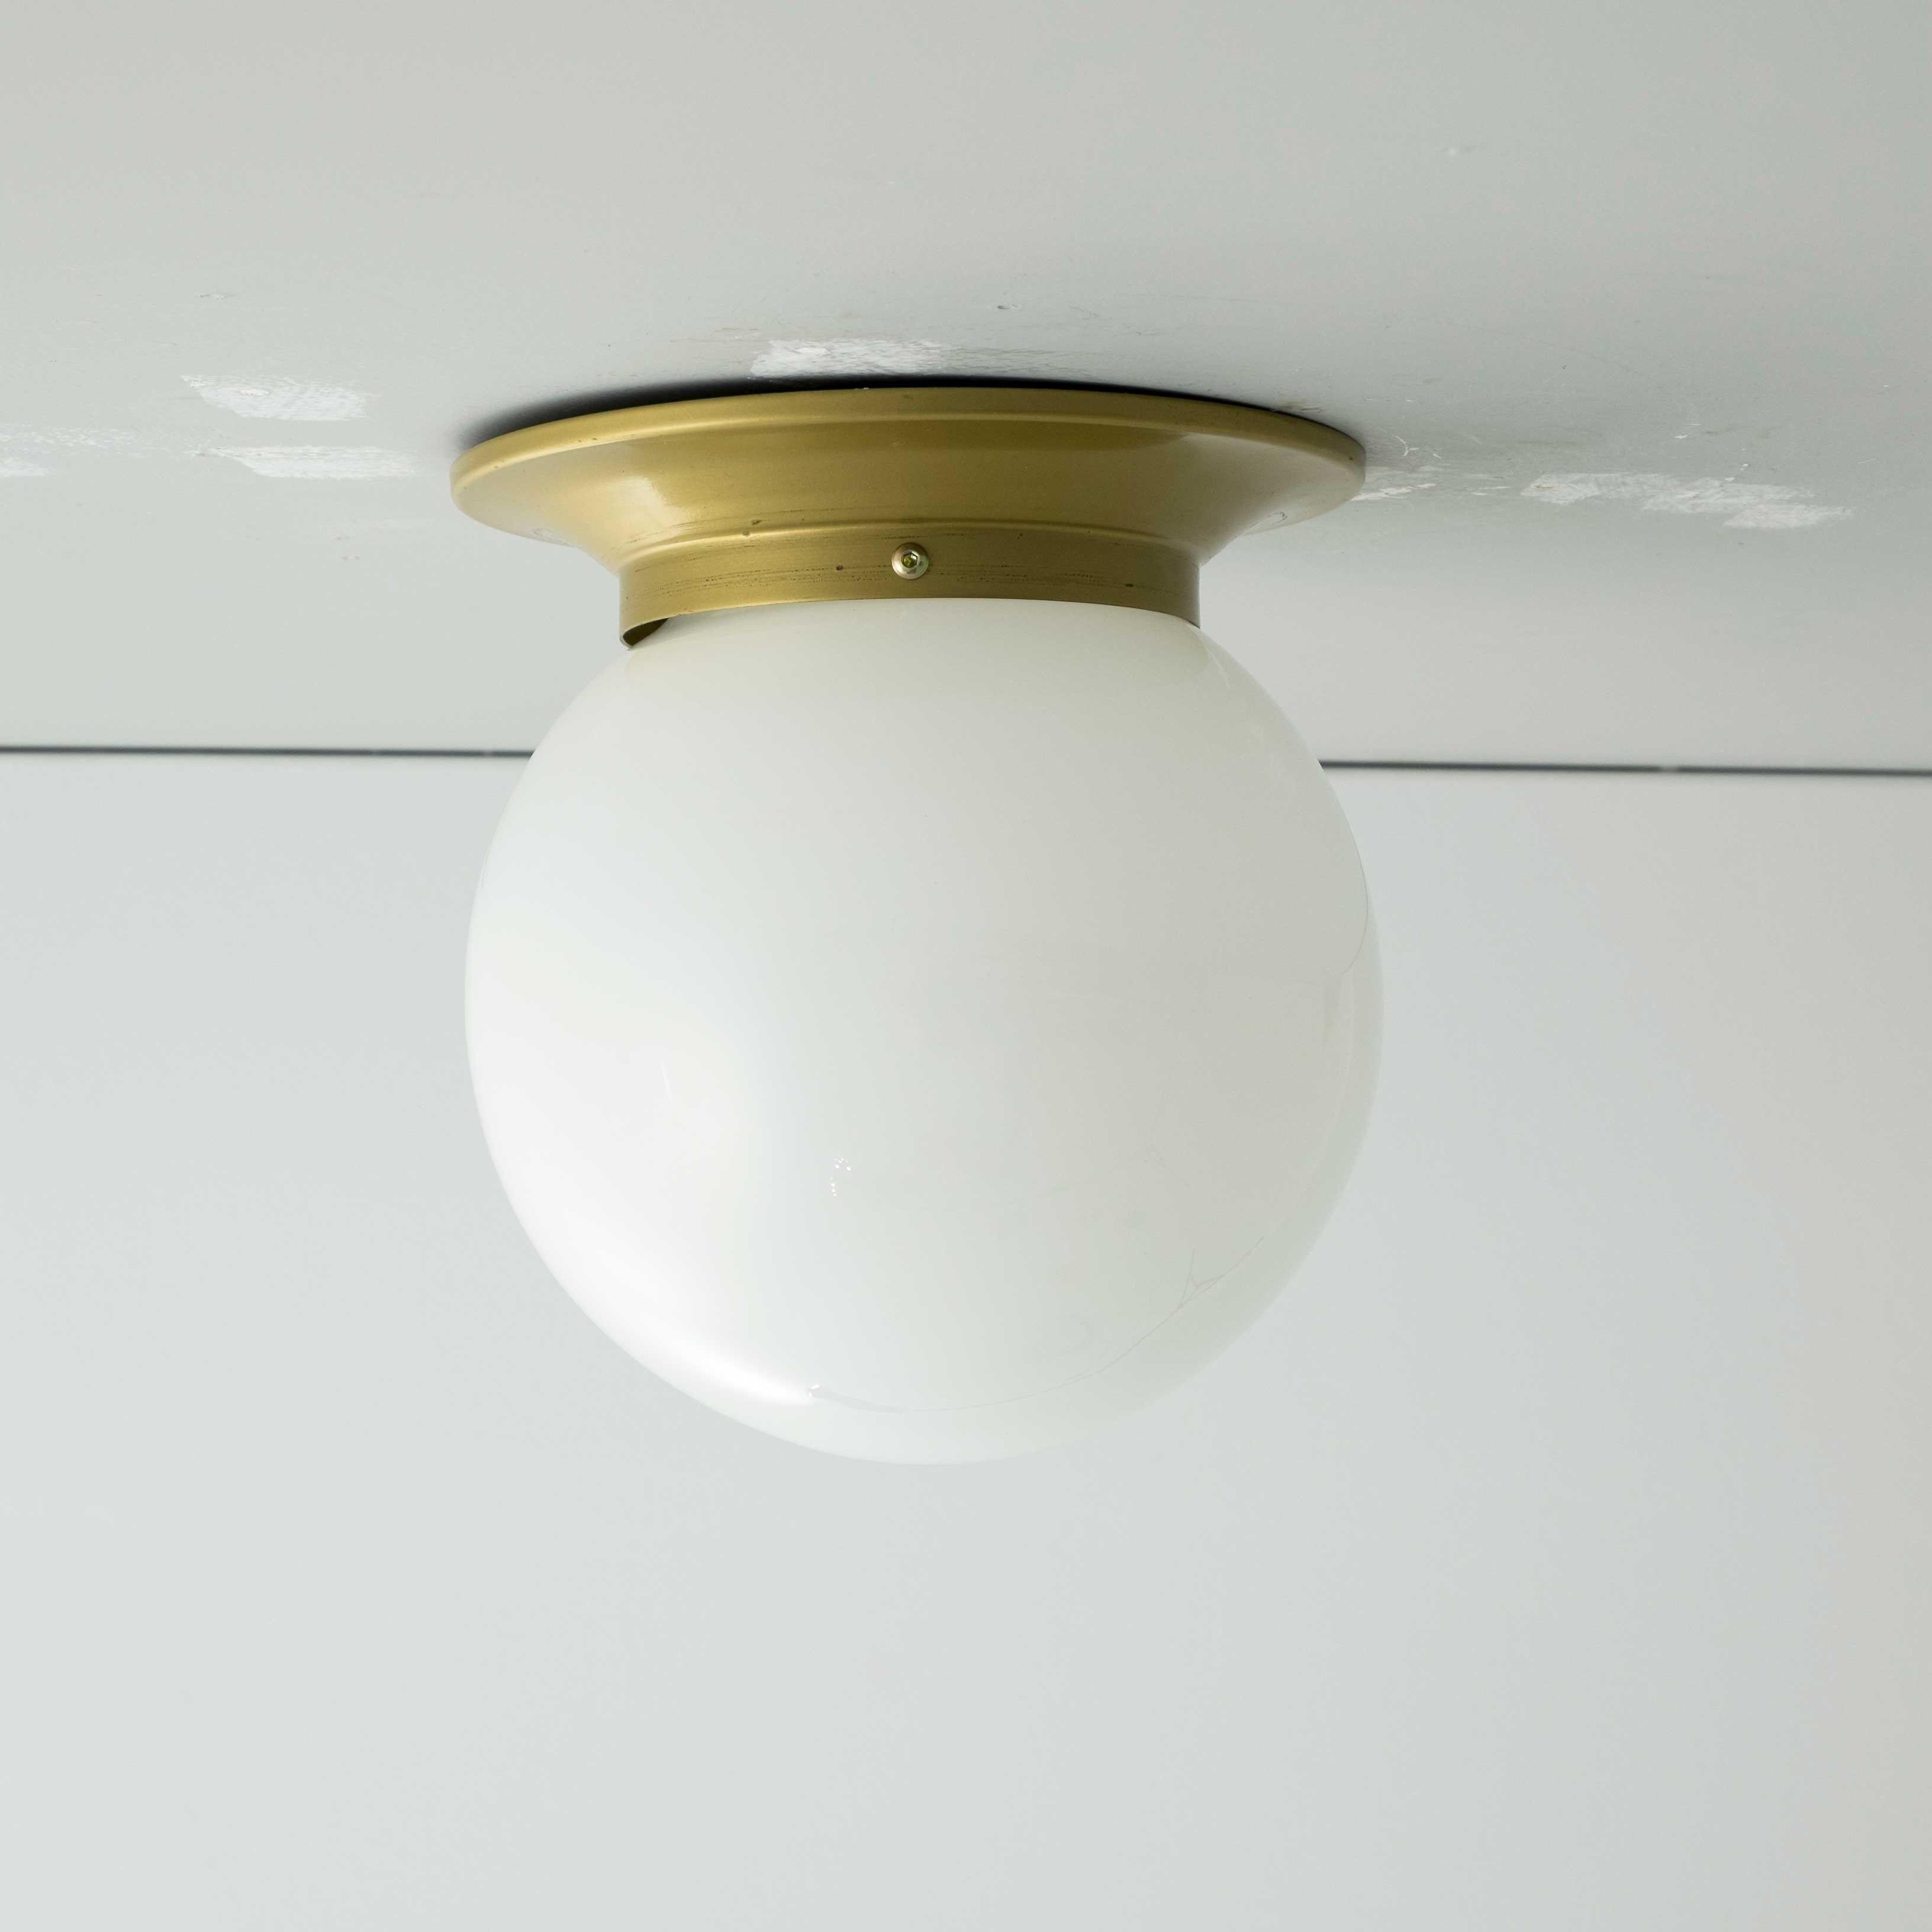 Plaf N Zocalo Bola De Cristal Opal 16cm Plafones Pinterest  ~ Plafones Fluorescentes Para Cocina